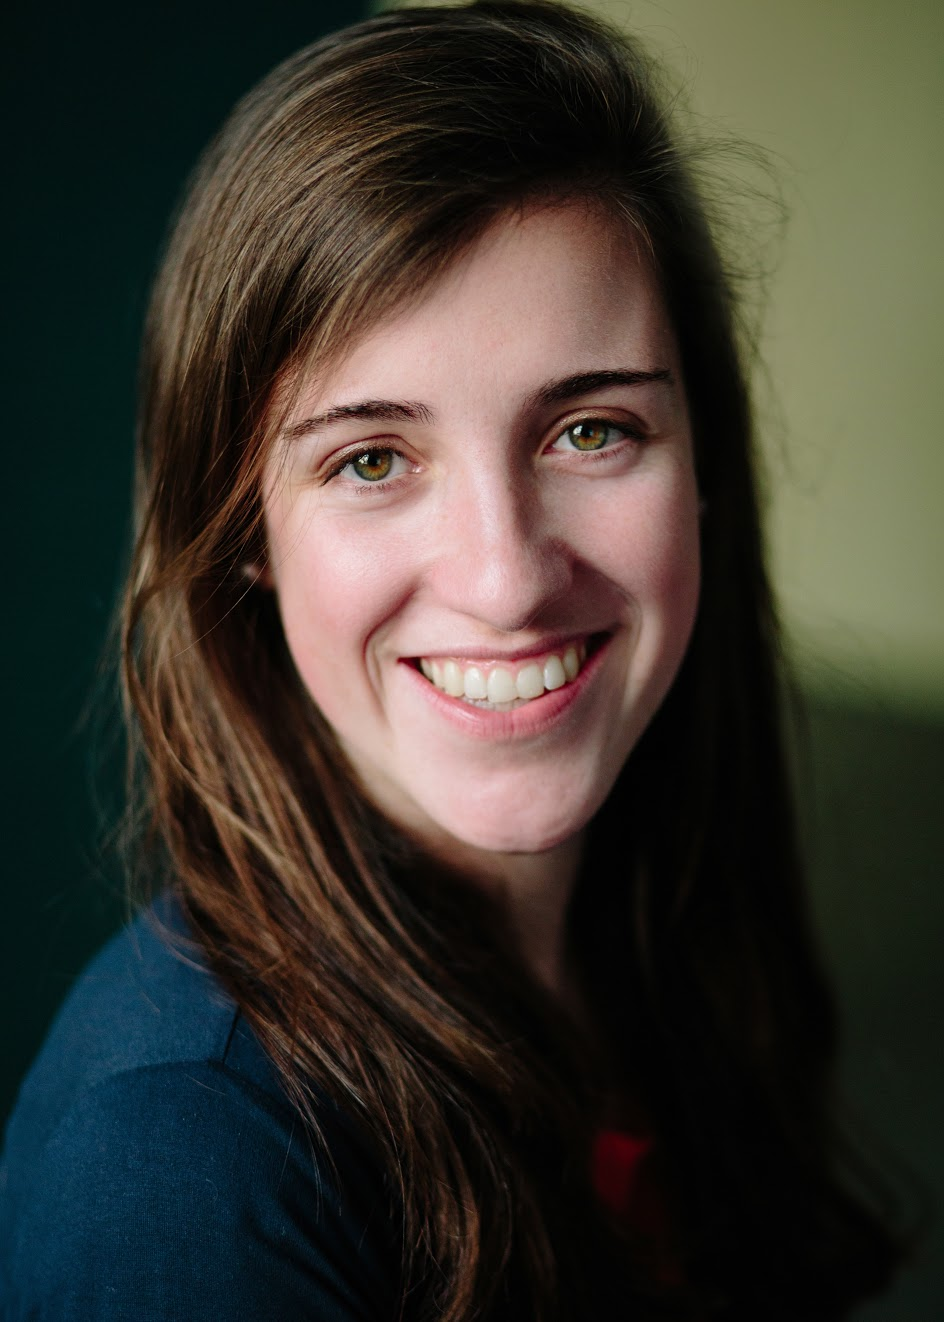 Sofie Vandenhende | Leap Forward